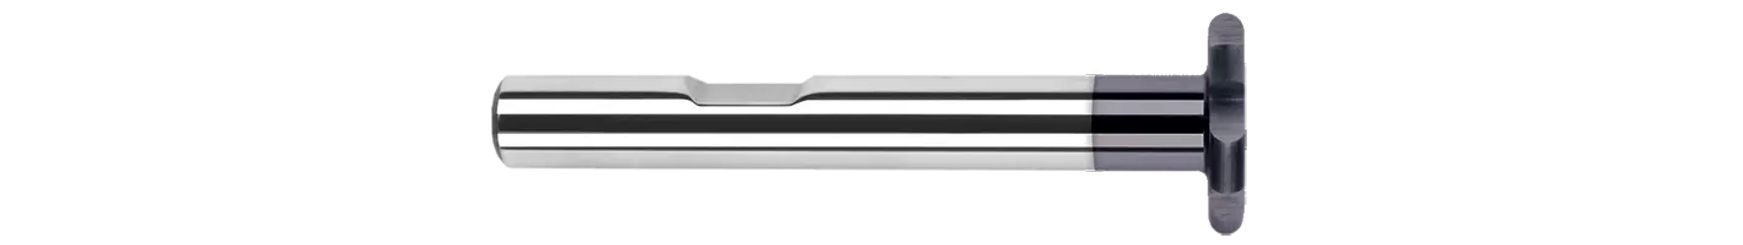 Keyseat Cutters - Full Radius - Reduced Shank